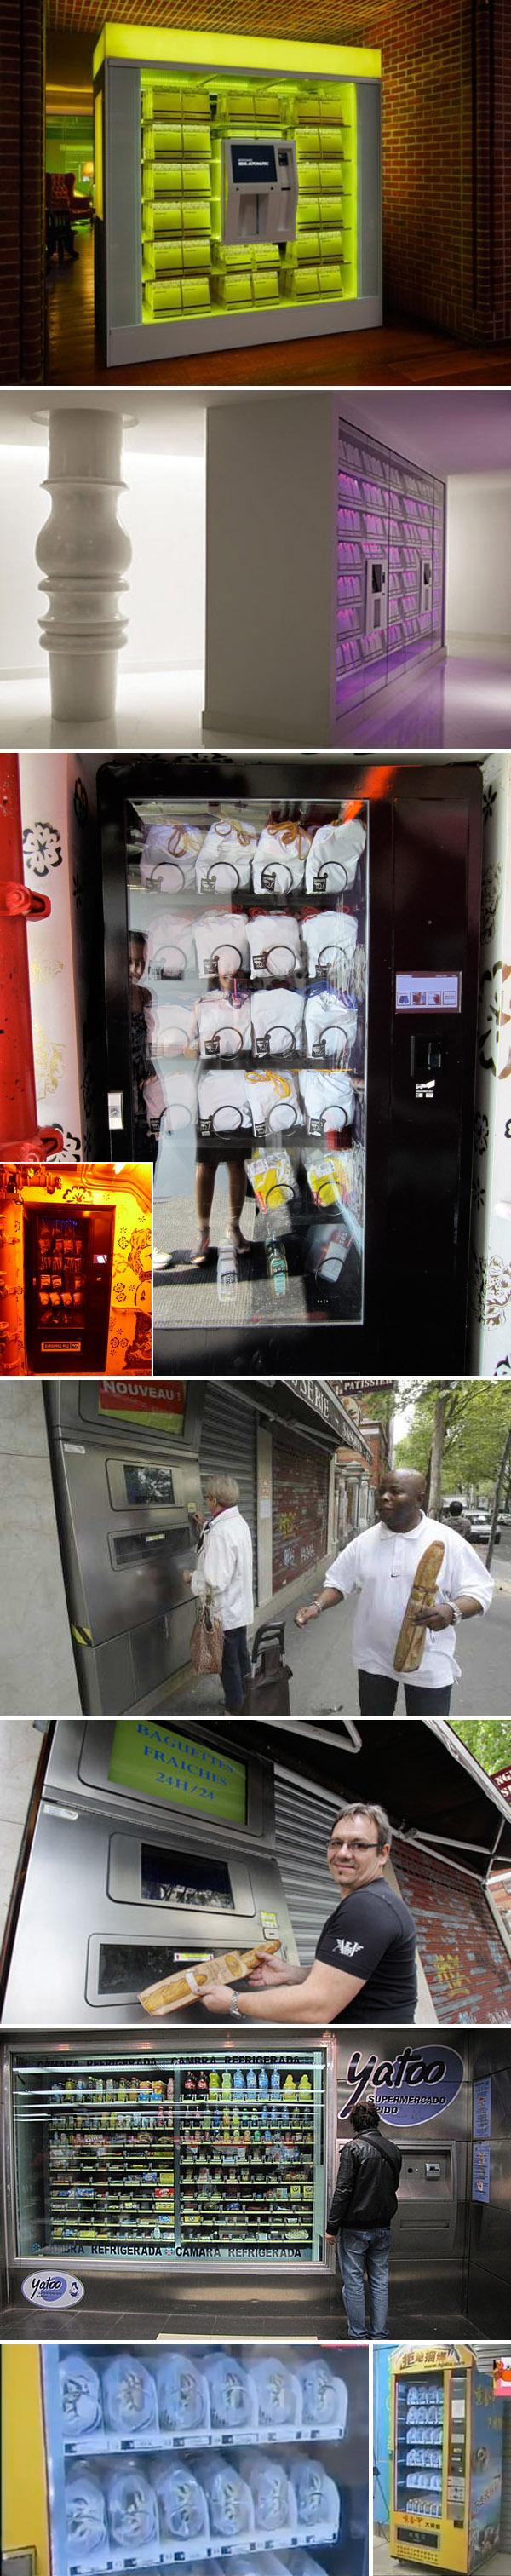 Cool Vending Machine, Fashion Week, Hudson Hotel, semi automatic, Mondrian, Baguettes